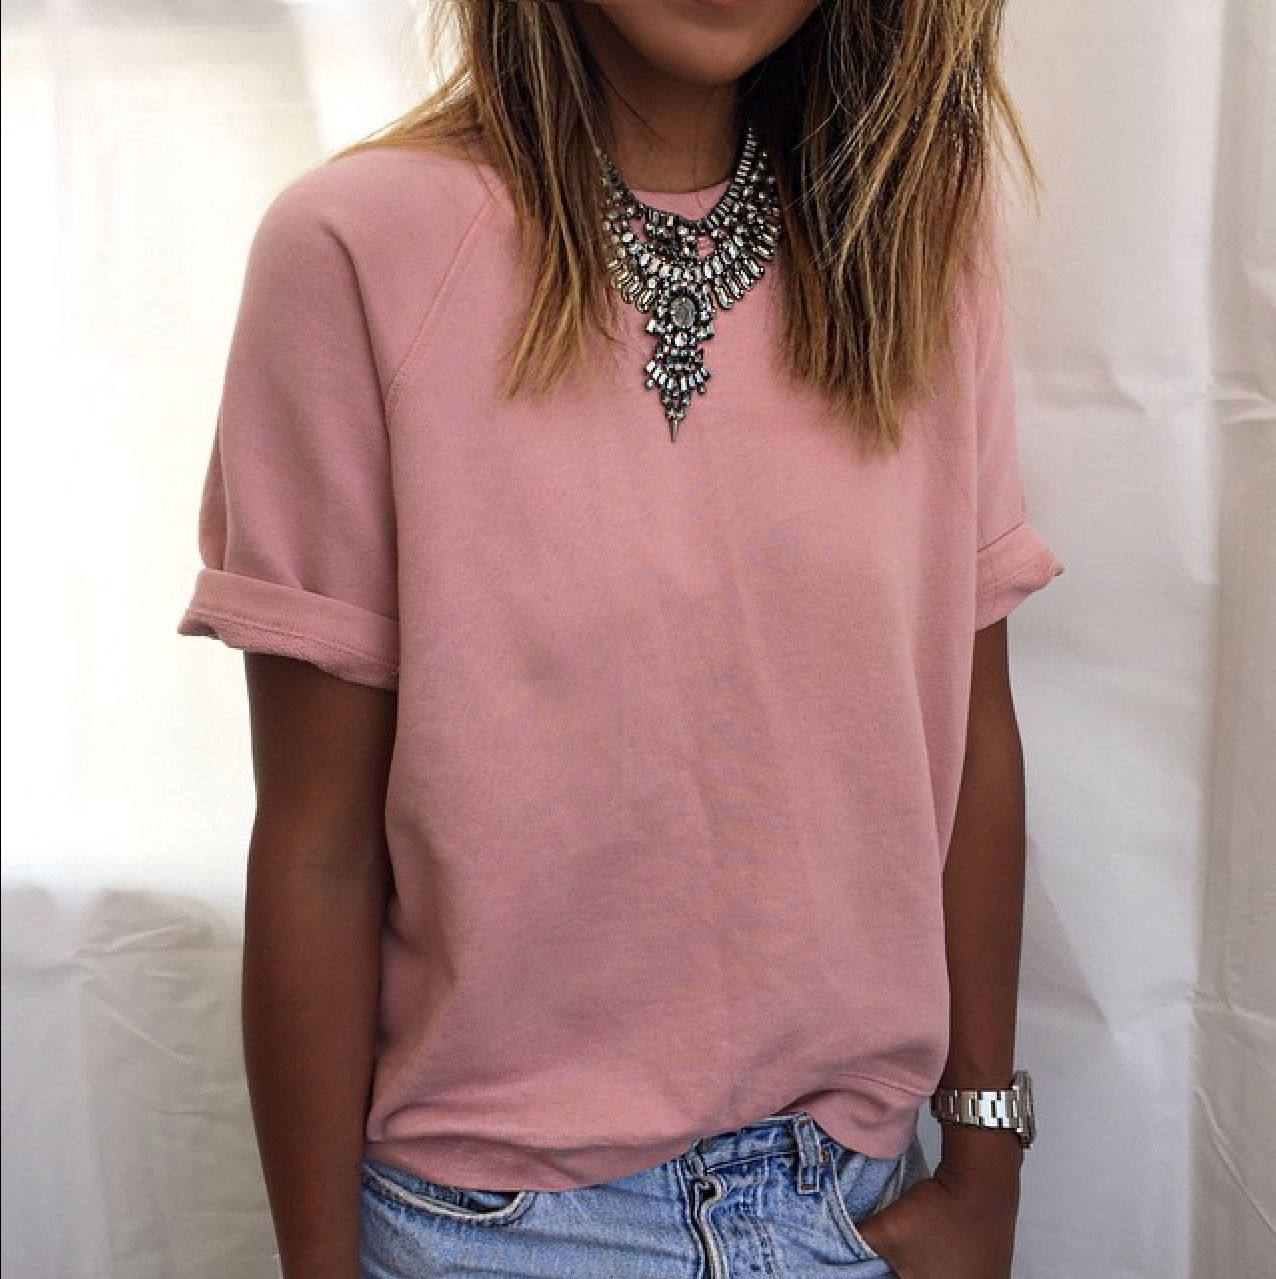 Resultado de imagen para necklace shirt